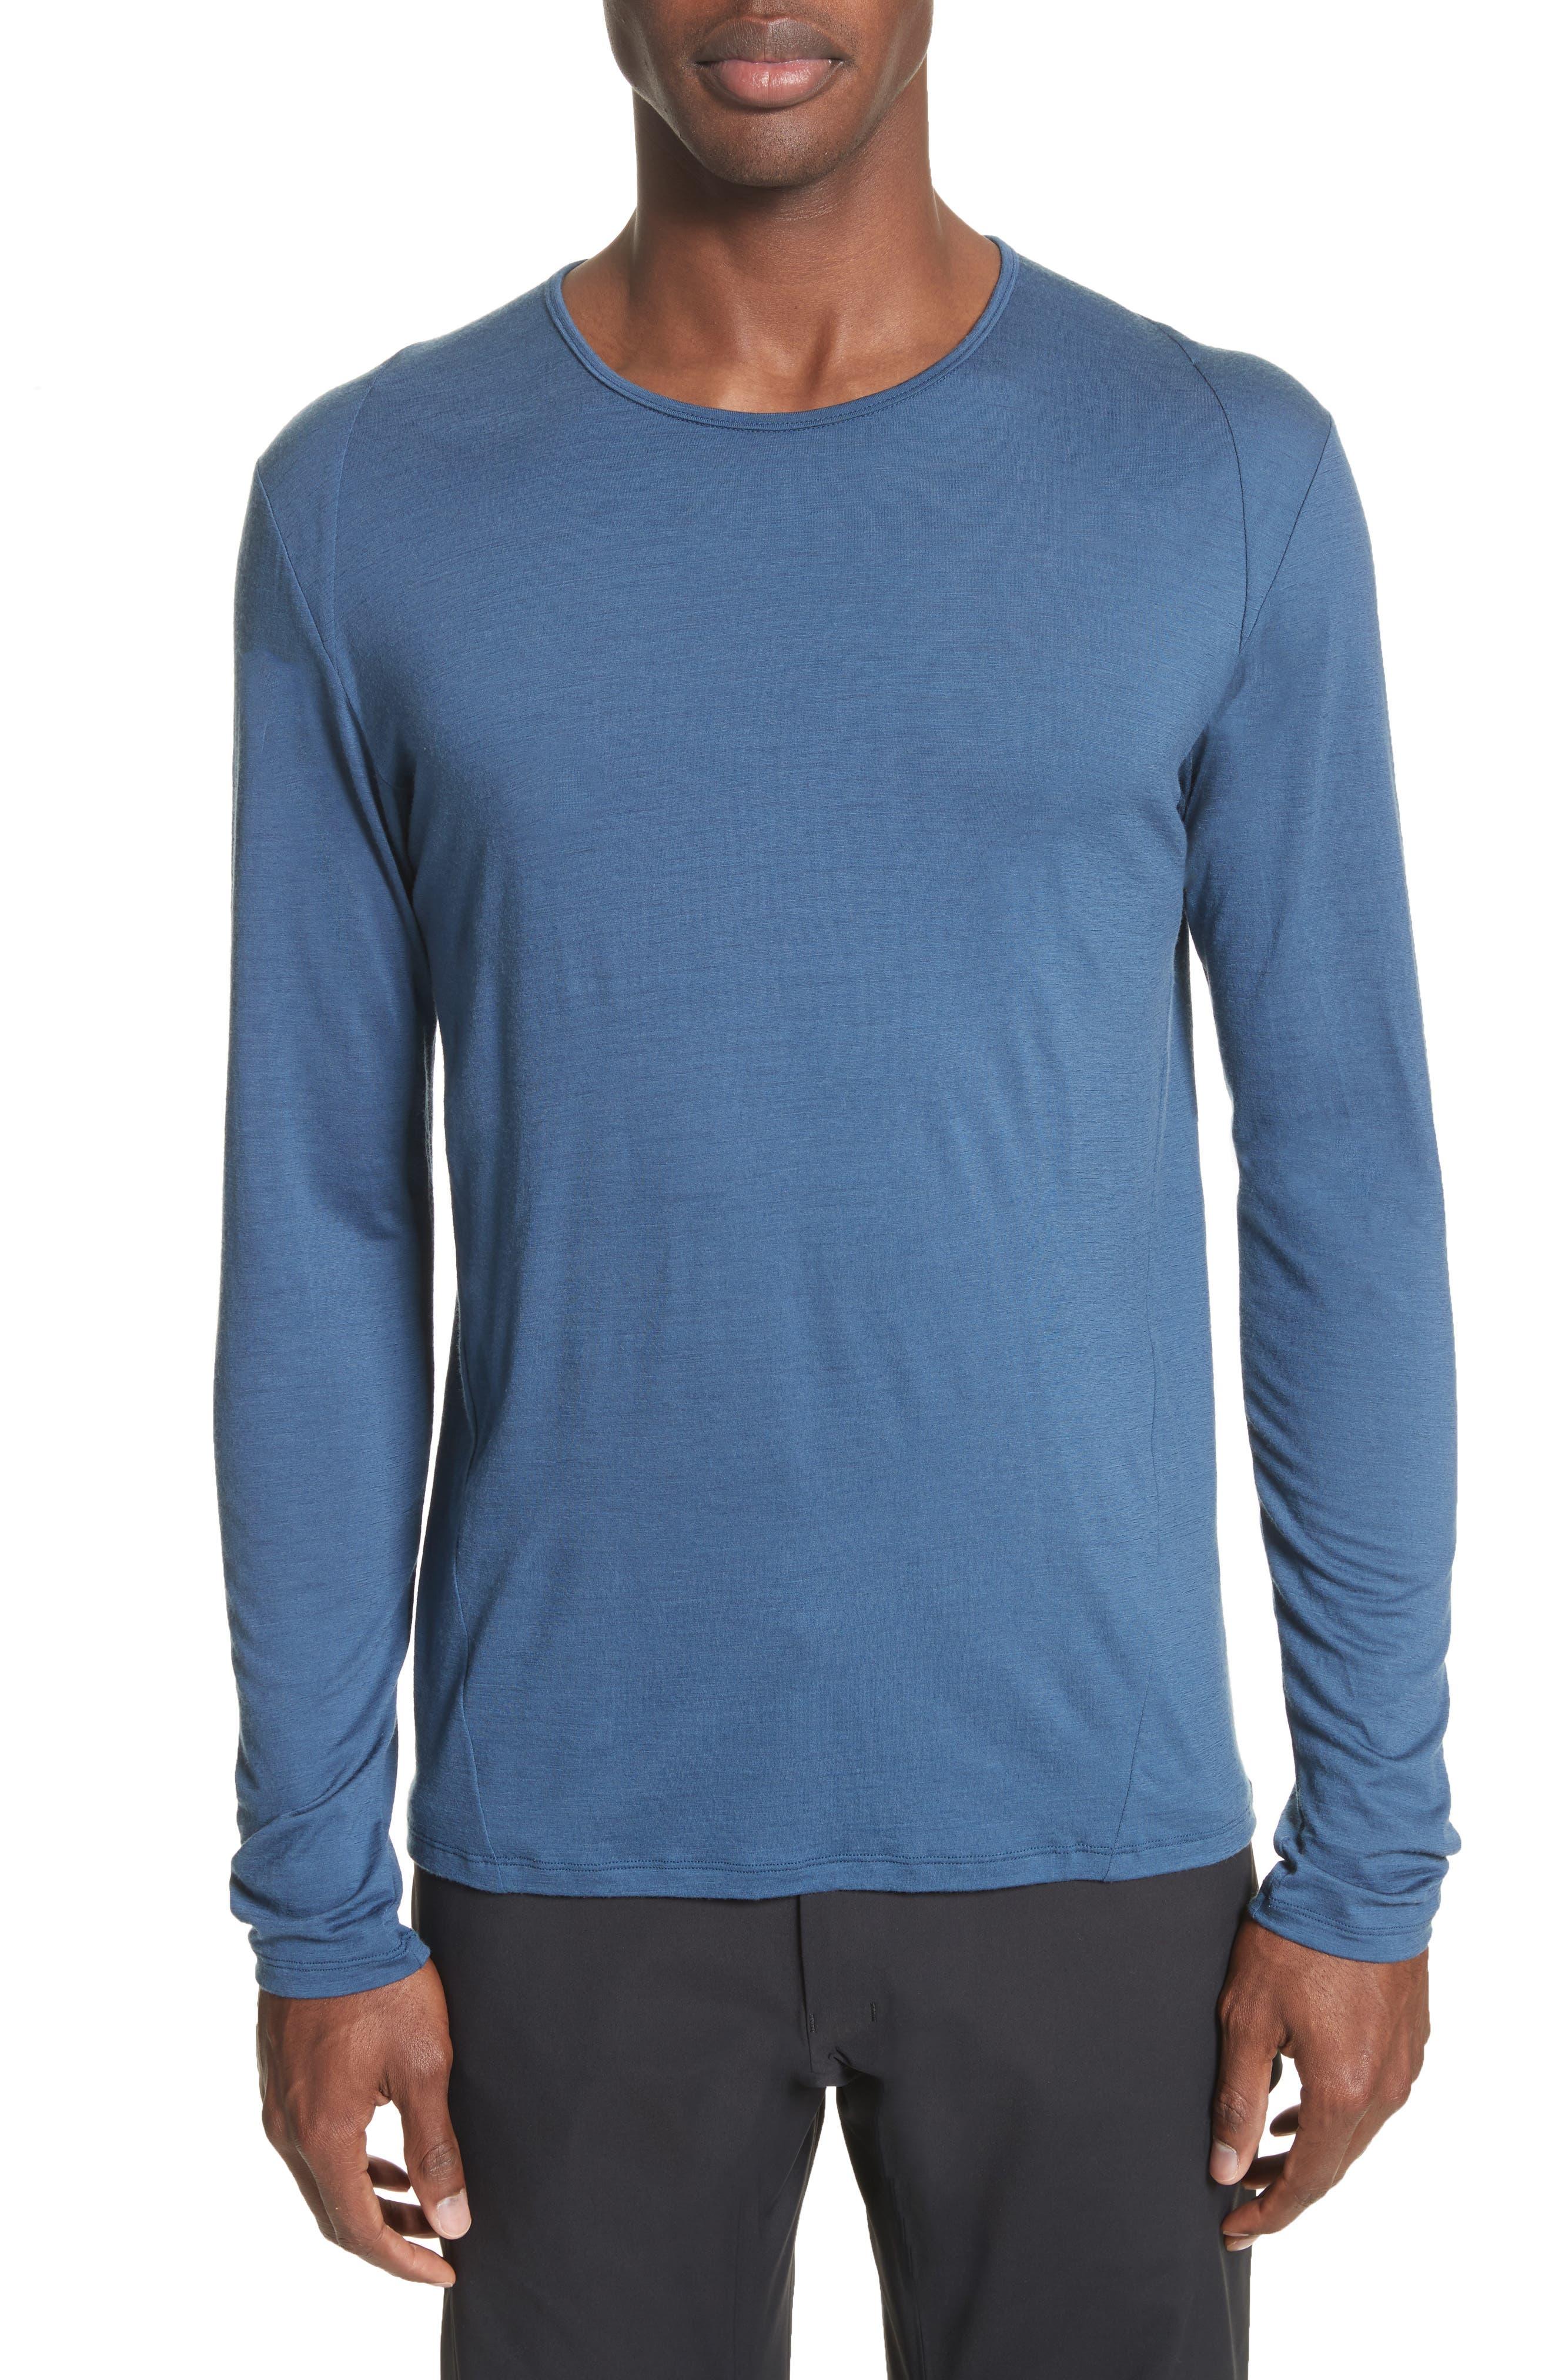 Frame Merino Wool T-Shirt,                             Main thumbnail 1, color,                             Navy